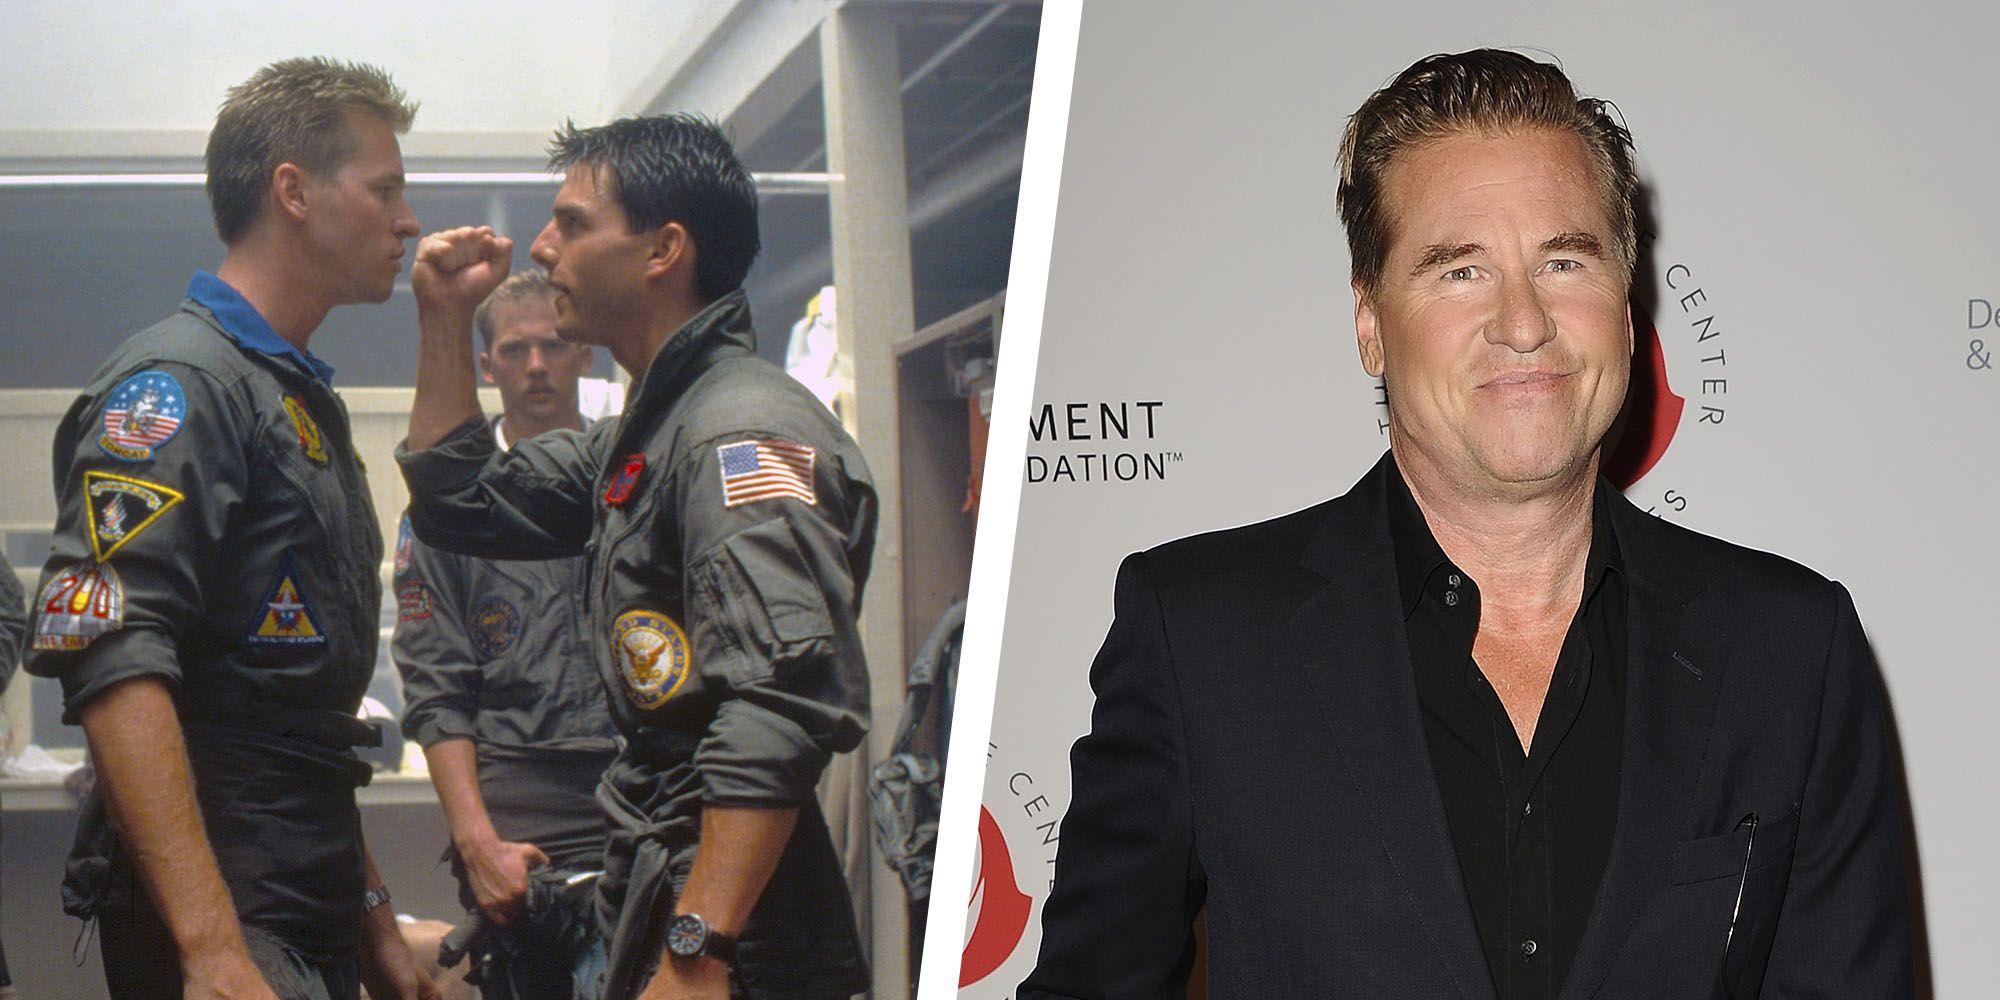 Val Kilmer to Appear in \'Top Gun 2\' - Top Gun 2 Cast, Release Date ...